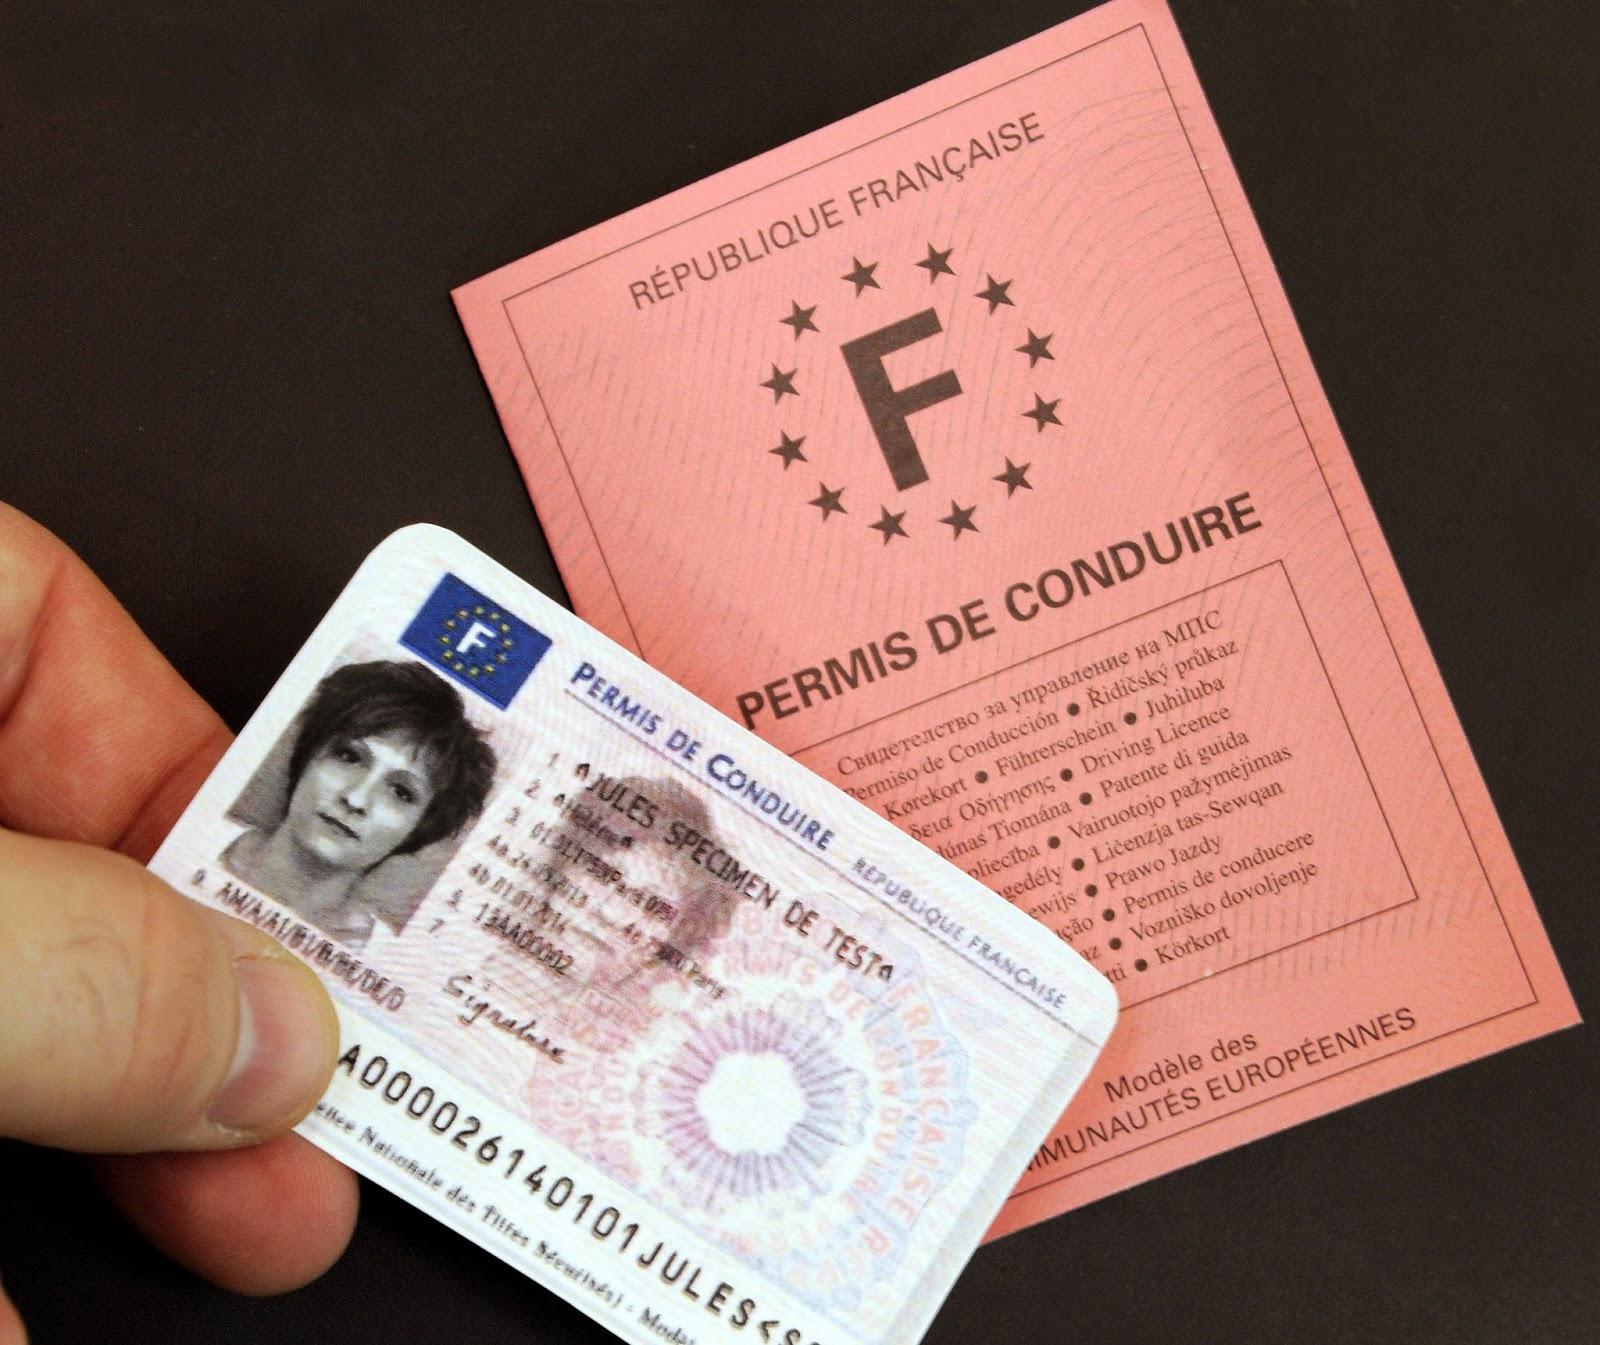 yescard 2018 2019 2020 2021 2022 2023 carte identit permis de conduire passeport et. Black Bedroom Furniture Sets. Home Design Ideas